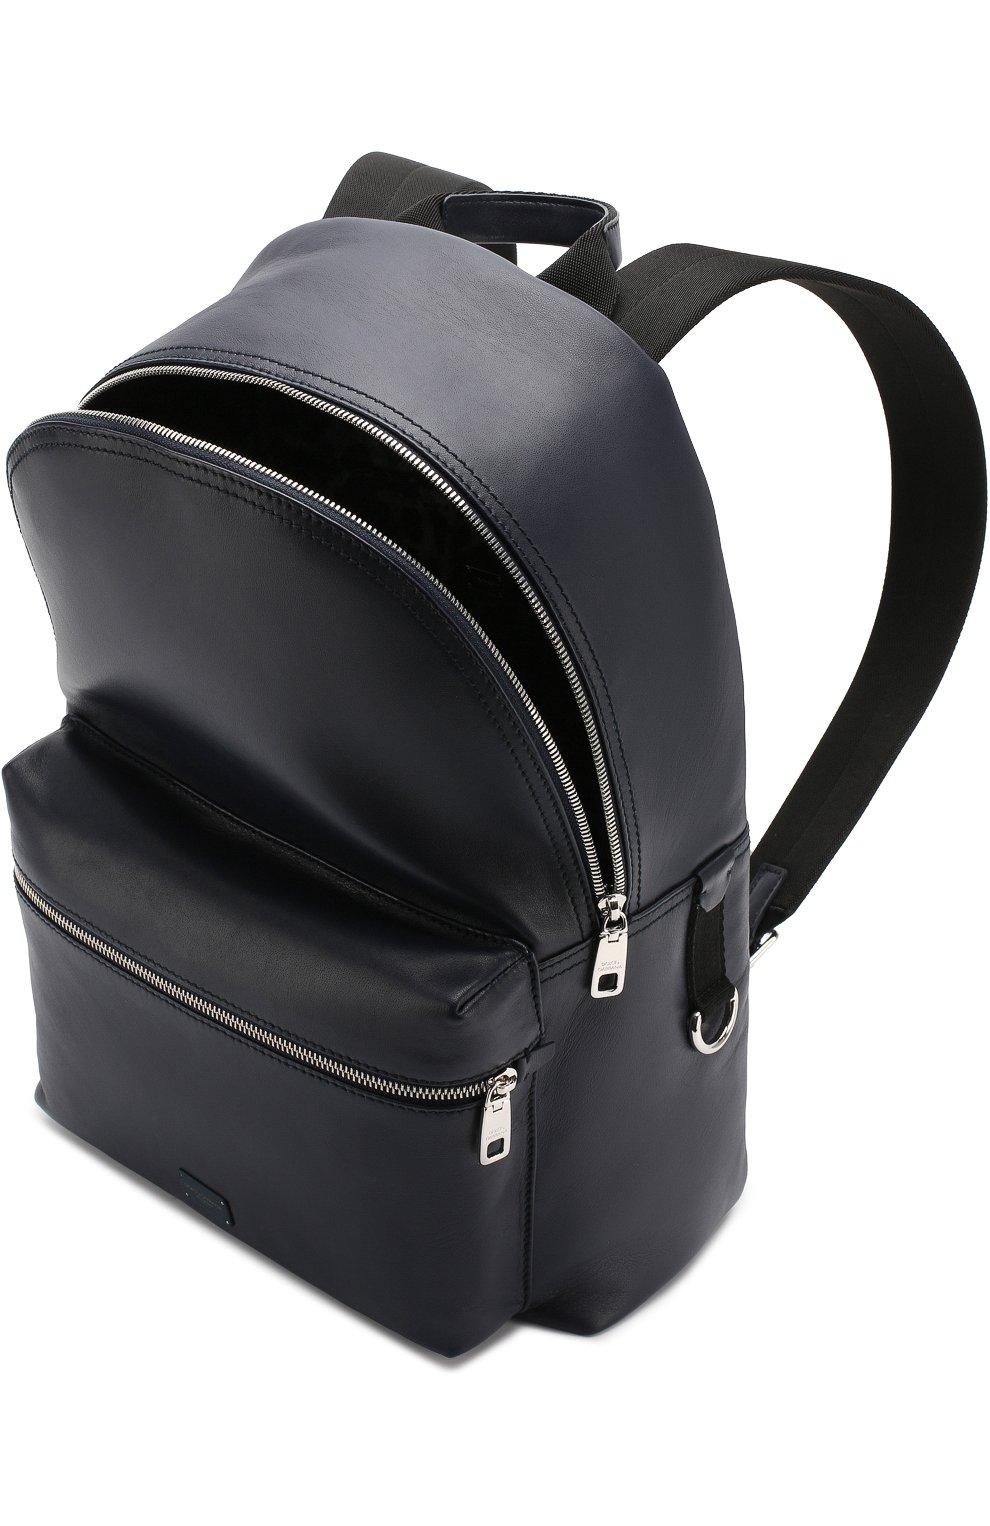 Кожаный рюкзак Vulcano с внешним карманом на молнии Dolce & Gabbana темно-синий | Фото №4